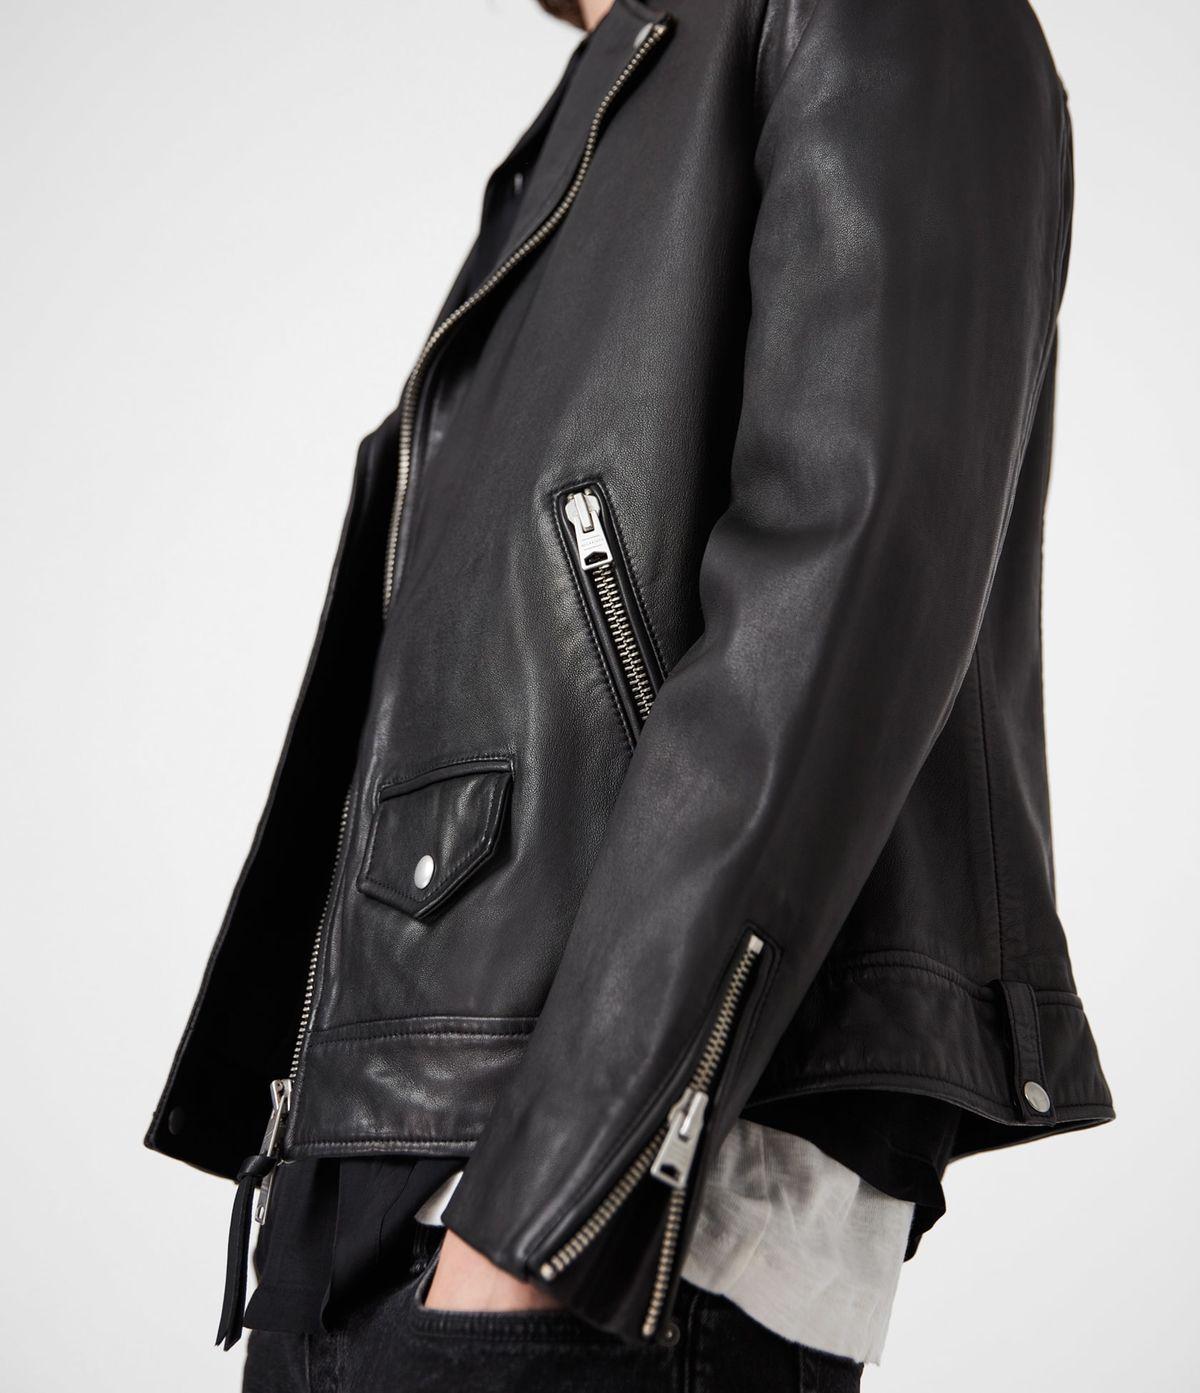 Men's Milo Leather Jacket - Side View